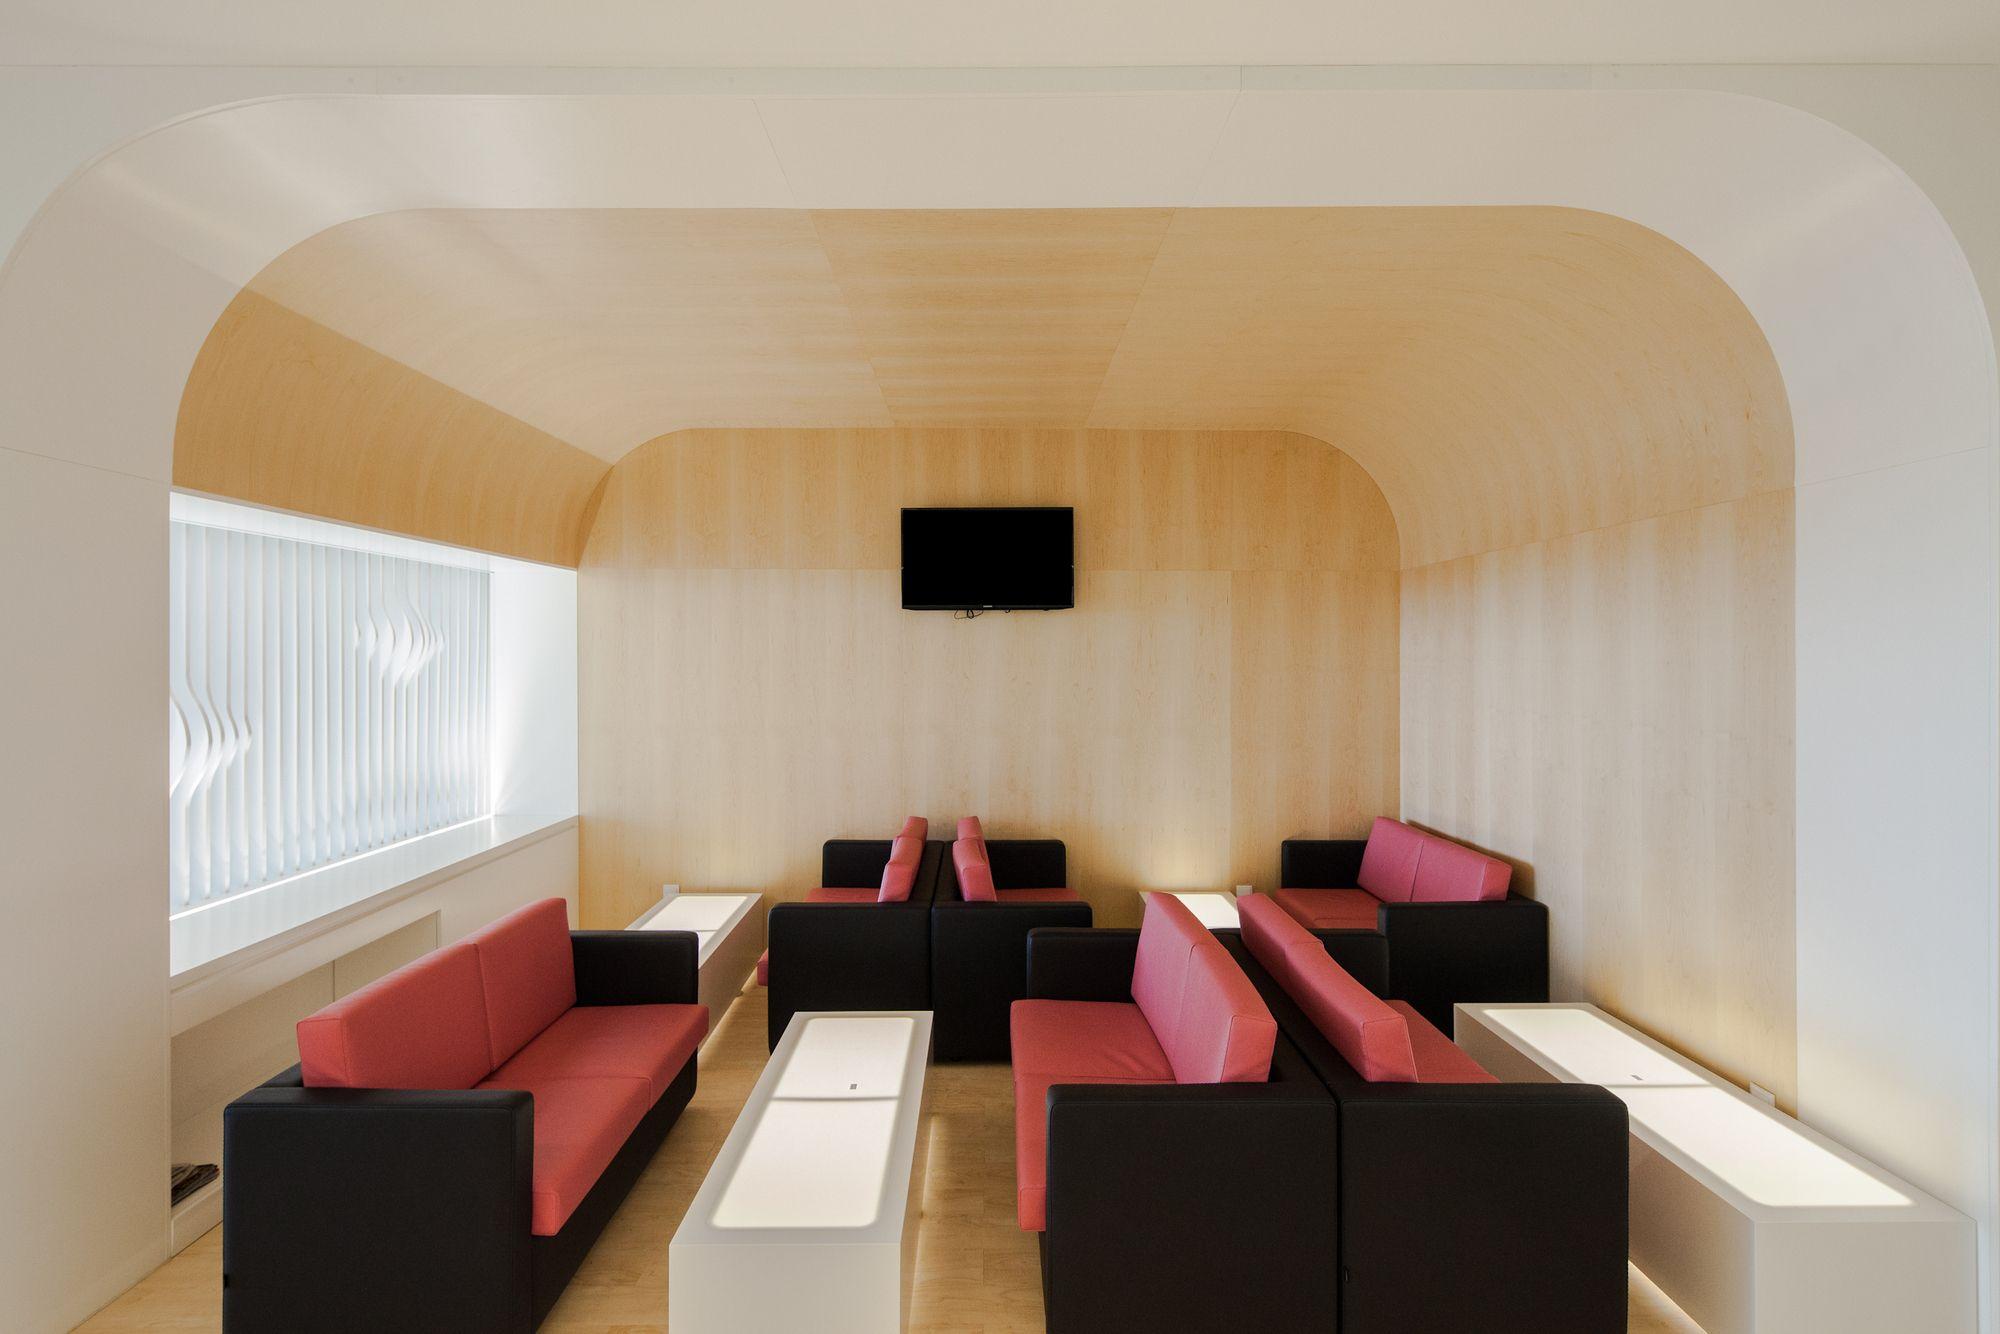 Galeria - Bakery / Paulo Merlini Arquitectura - 31